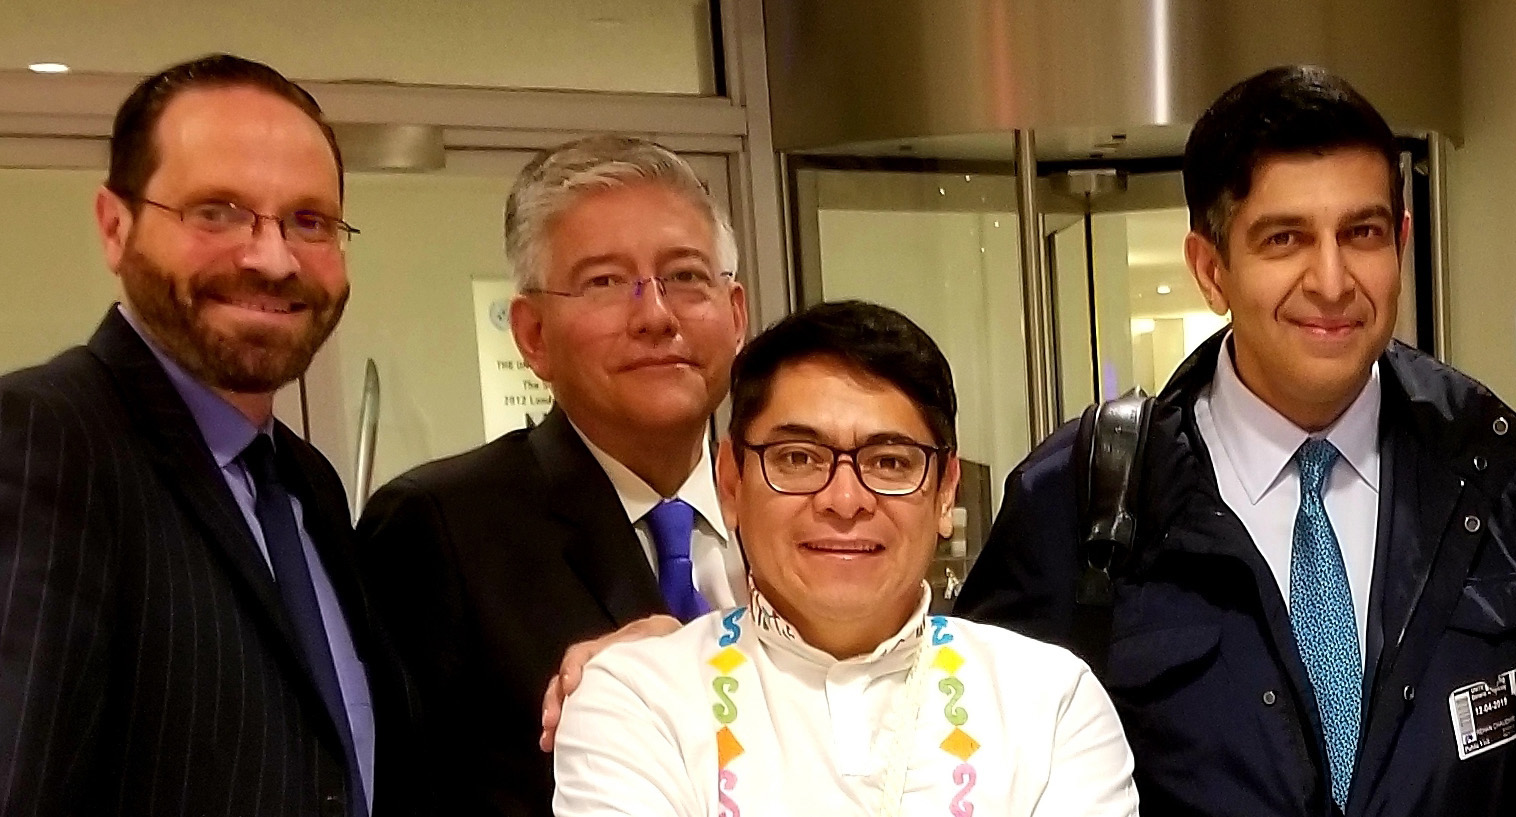 Michael Reiss Luis Galvis Cuy Armando Gómez Rehan Chaudhri